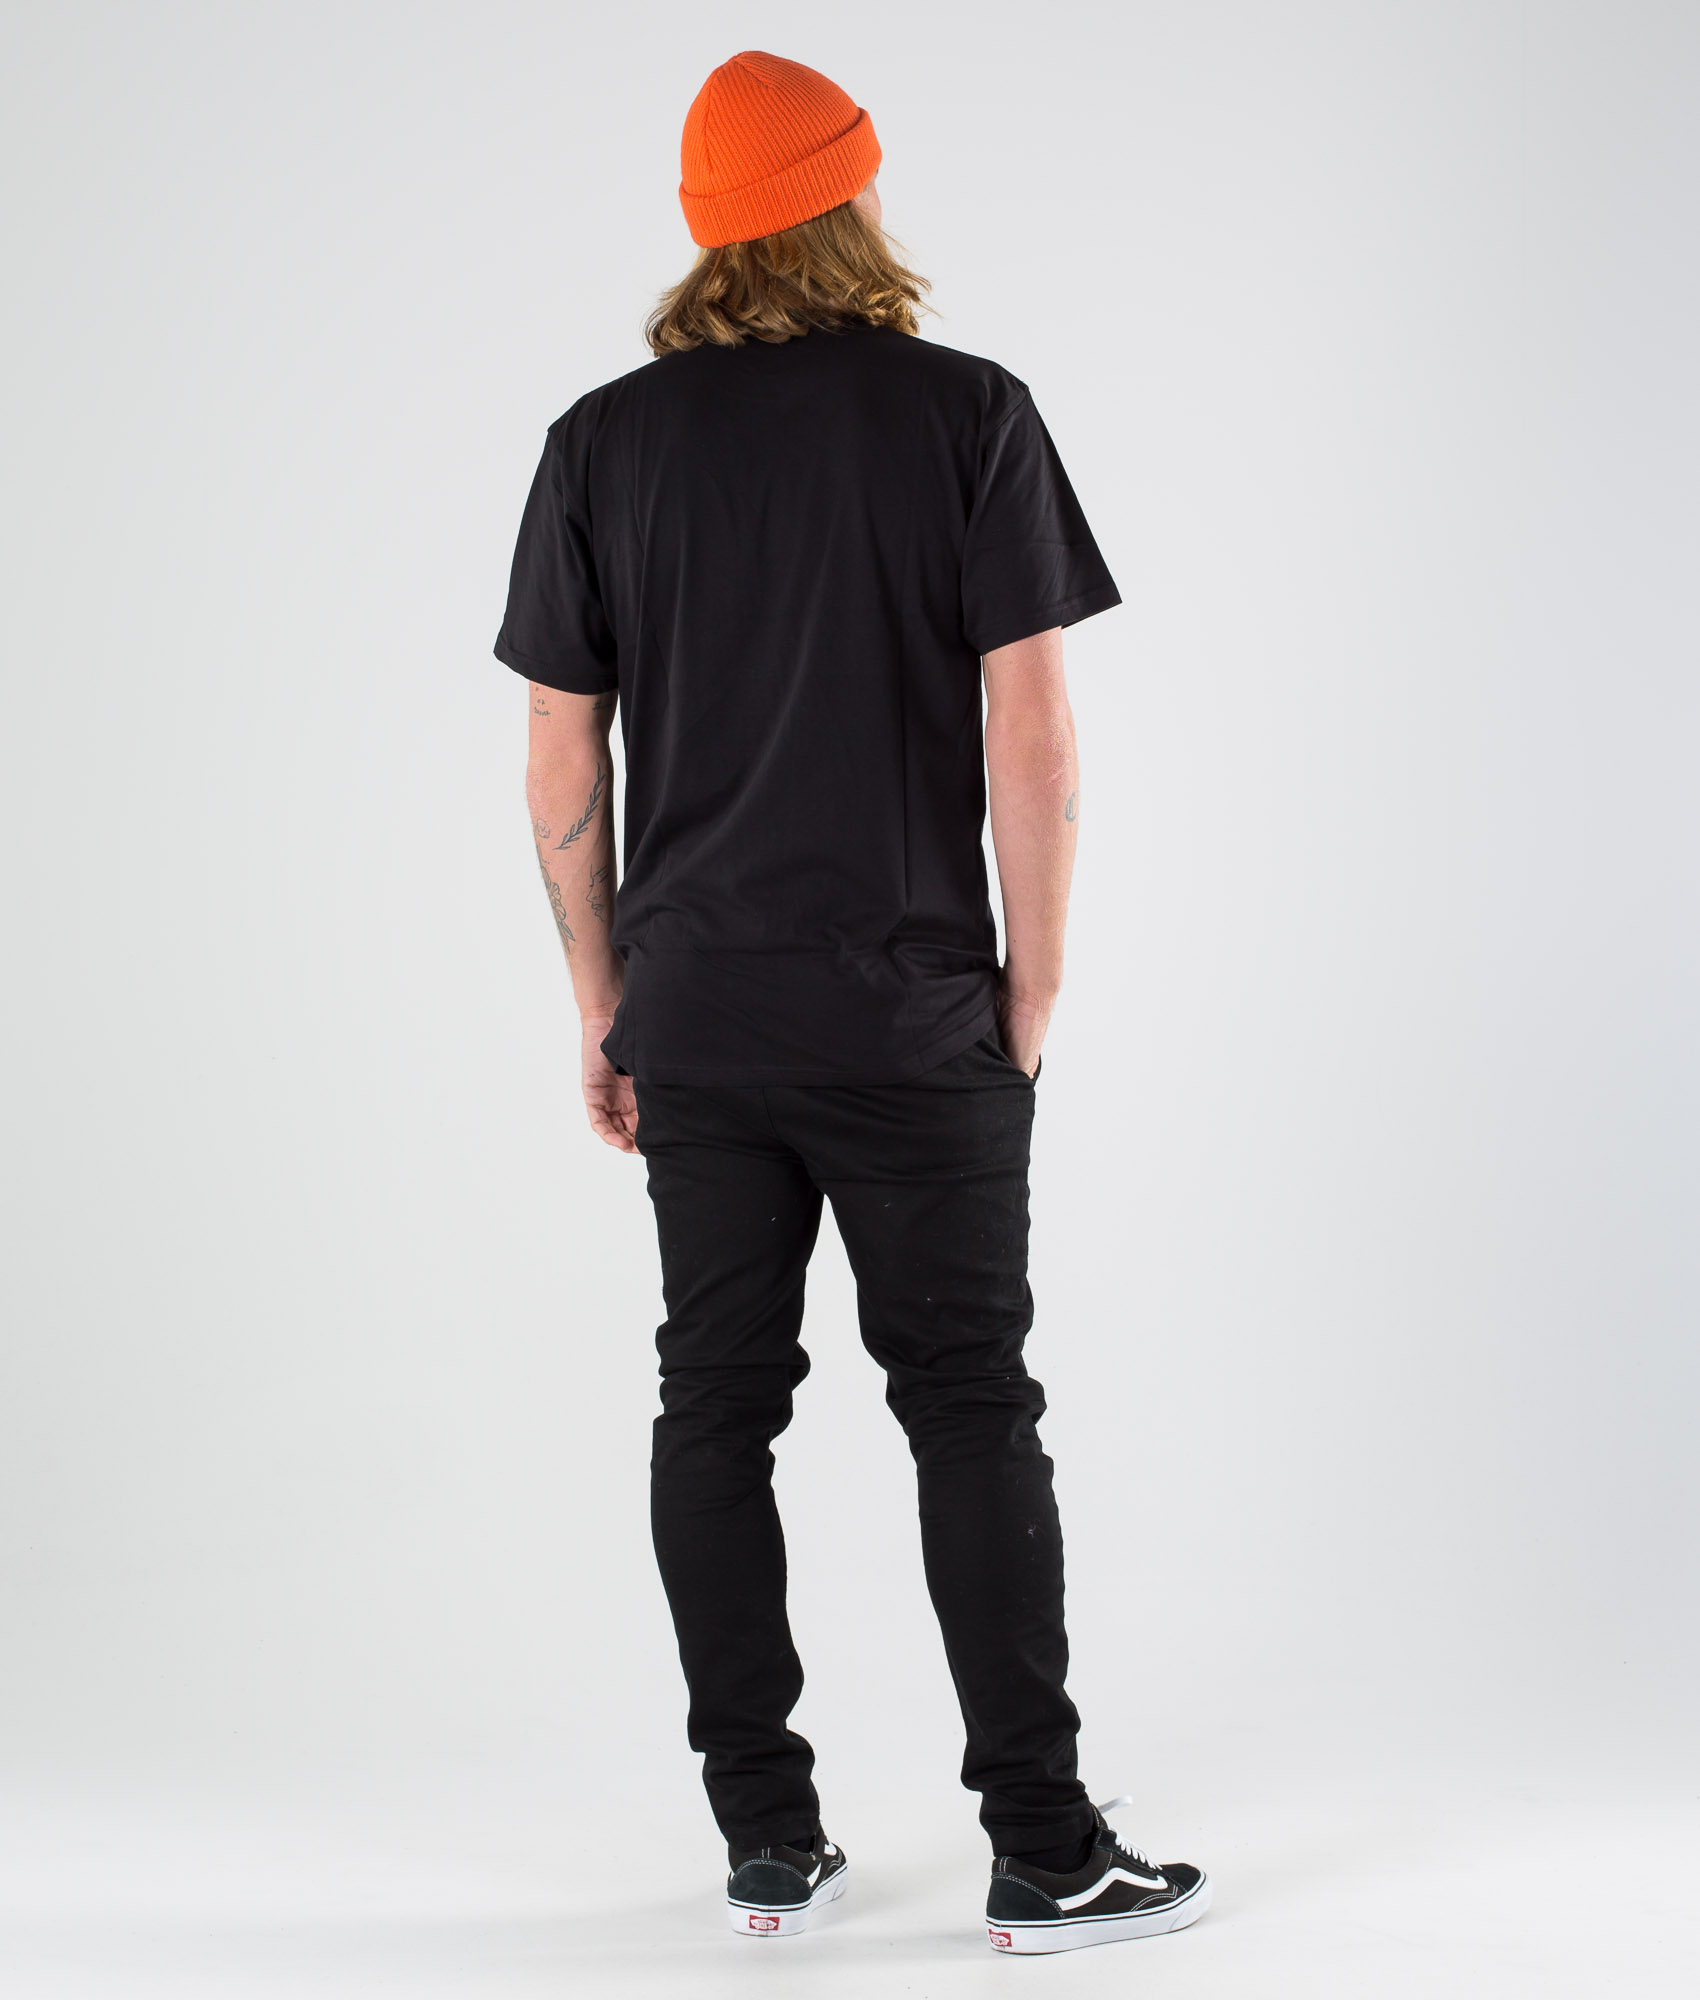 Vans Hi Point T Shirt Black